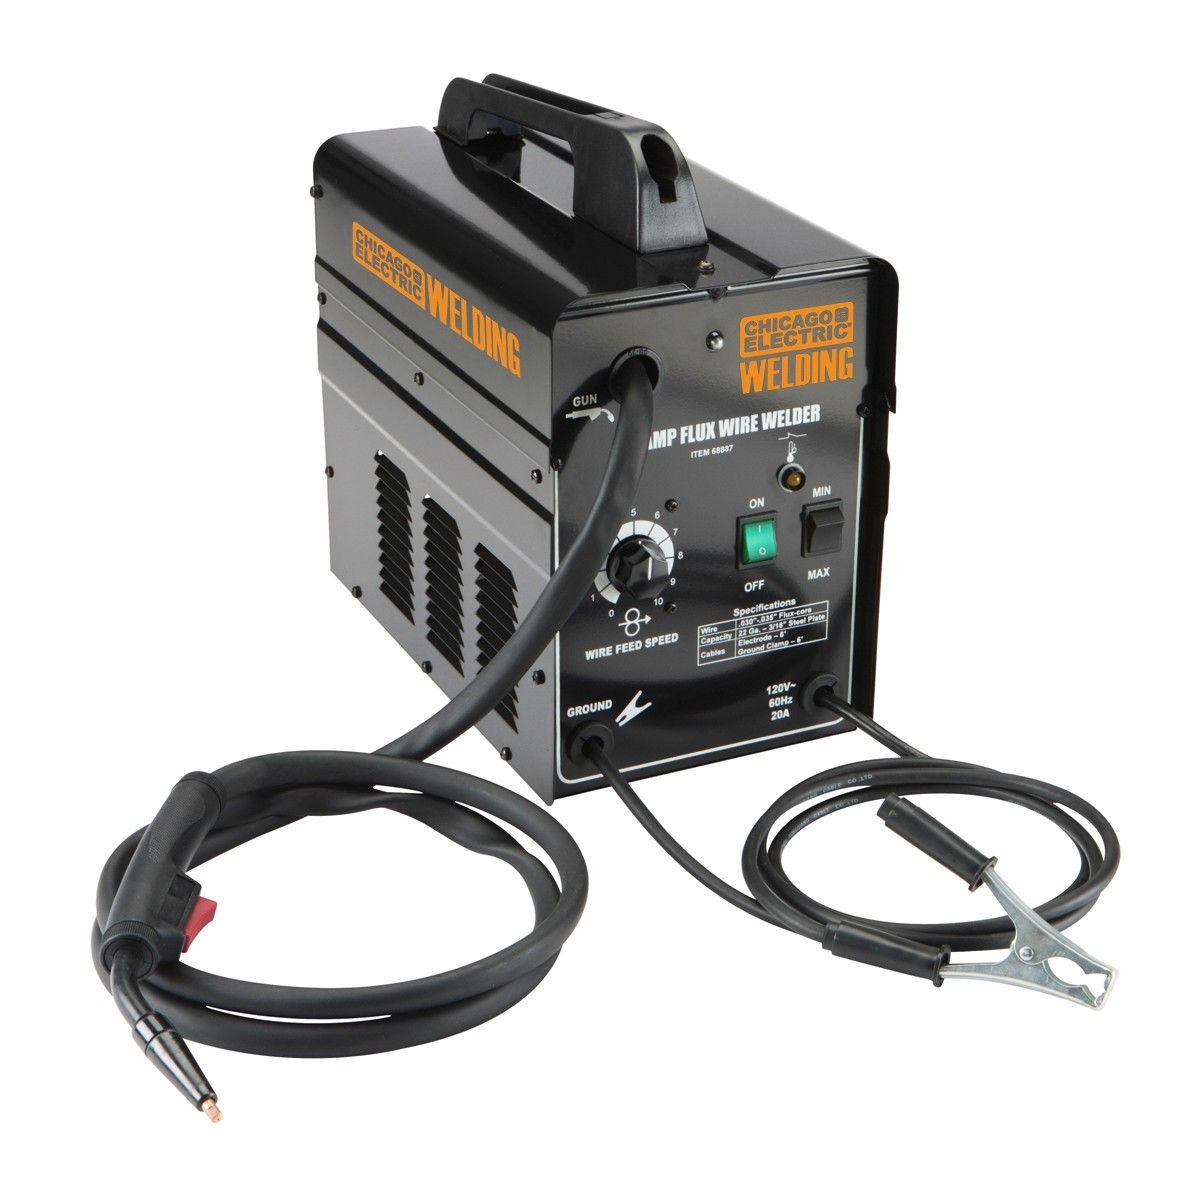 small resolution of  89 99 chicago electric welding 68887 90 amp flux wire welder black friday blackfriday harborfreight